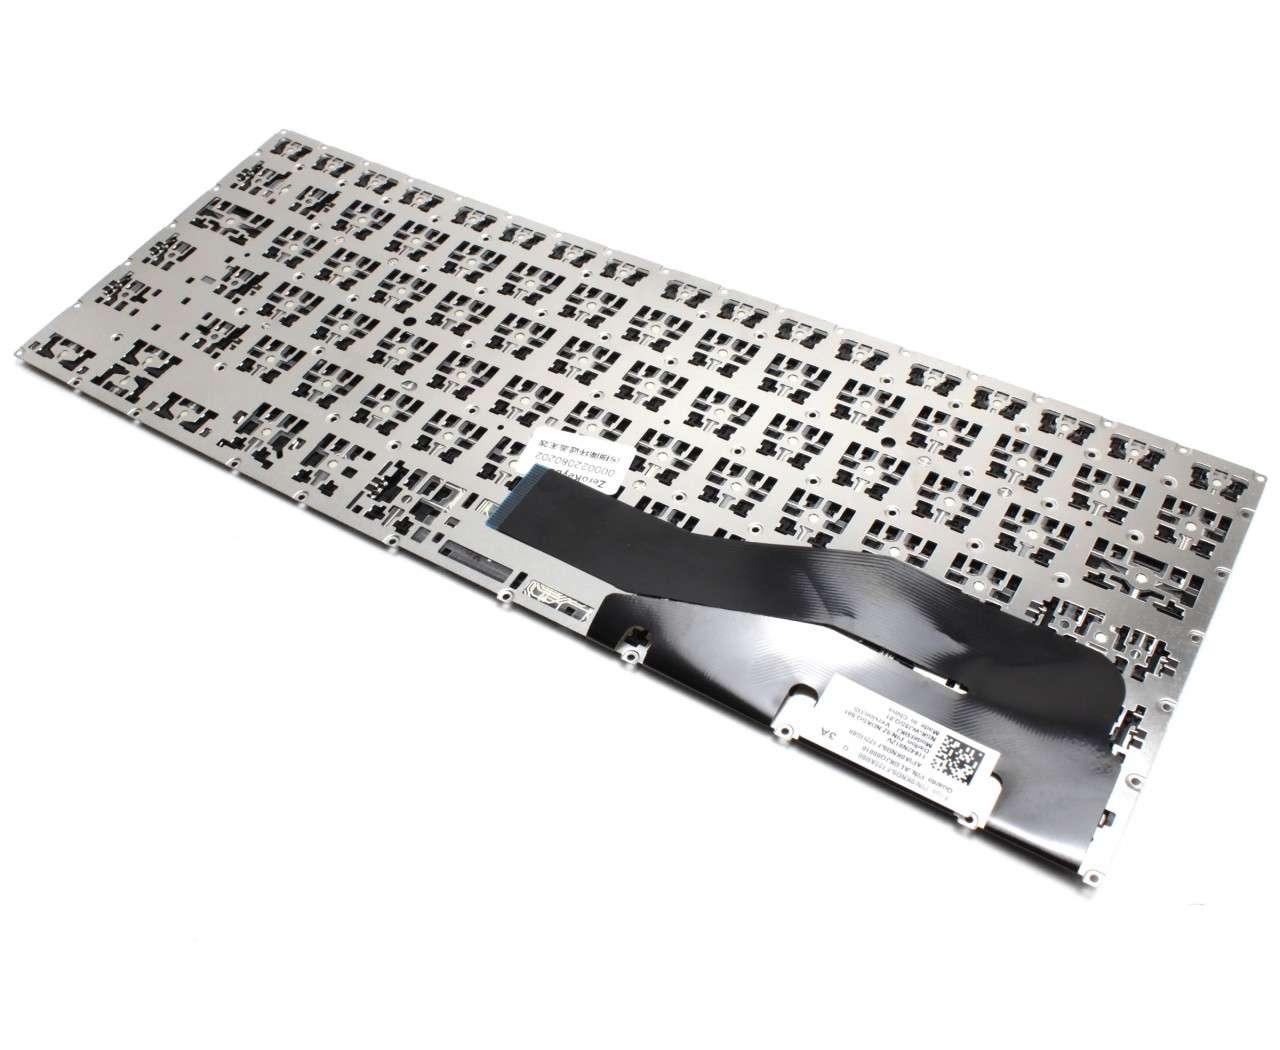 Tastatura Asus 0KNB0-F122AR00 layout US fara rama enter mic imagine